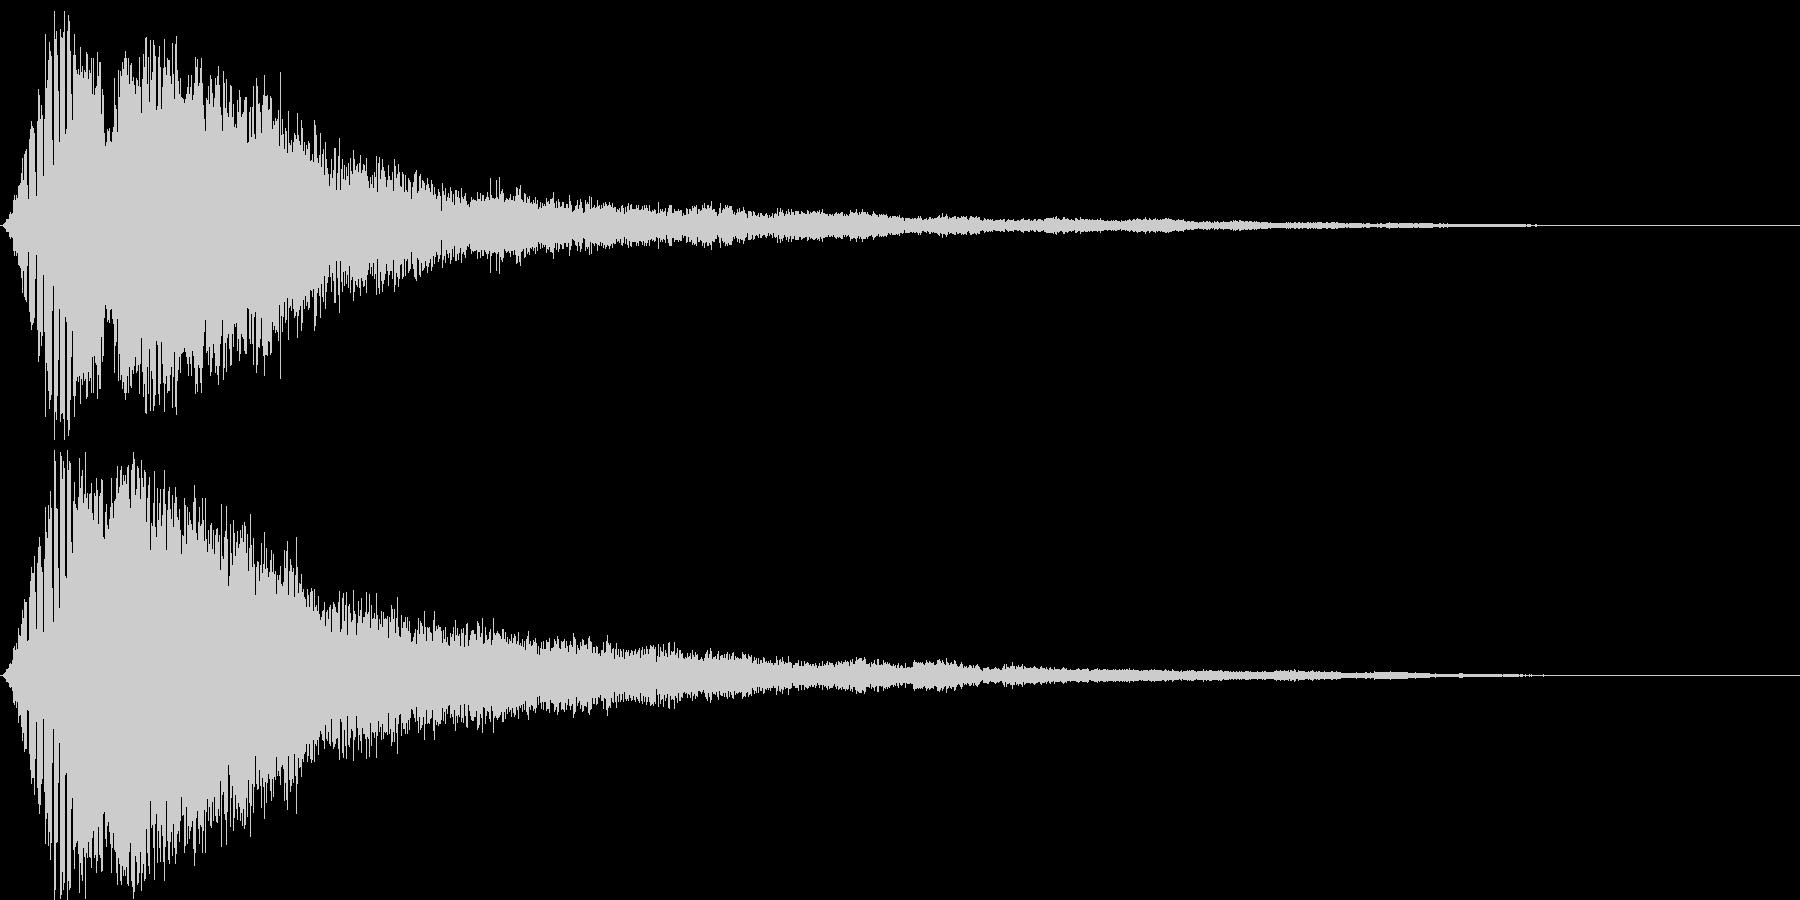 電子音・衝撃音(映画・映像作品)の未再生の波形